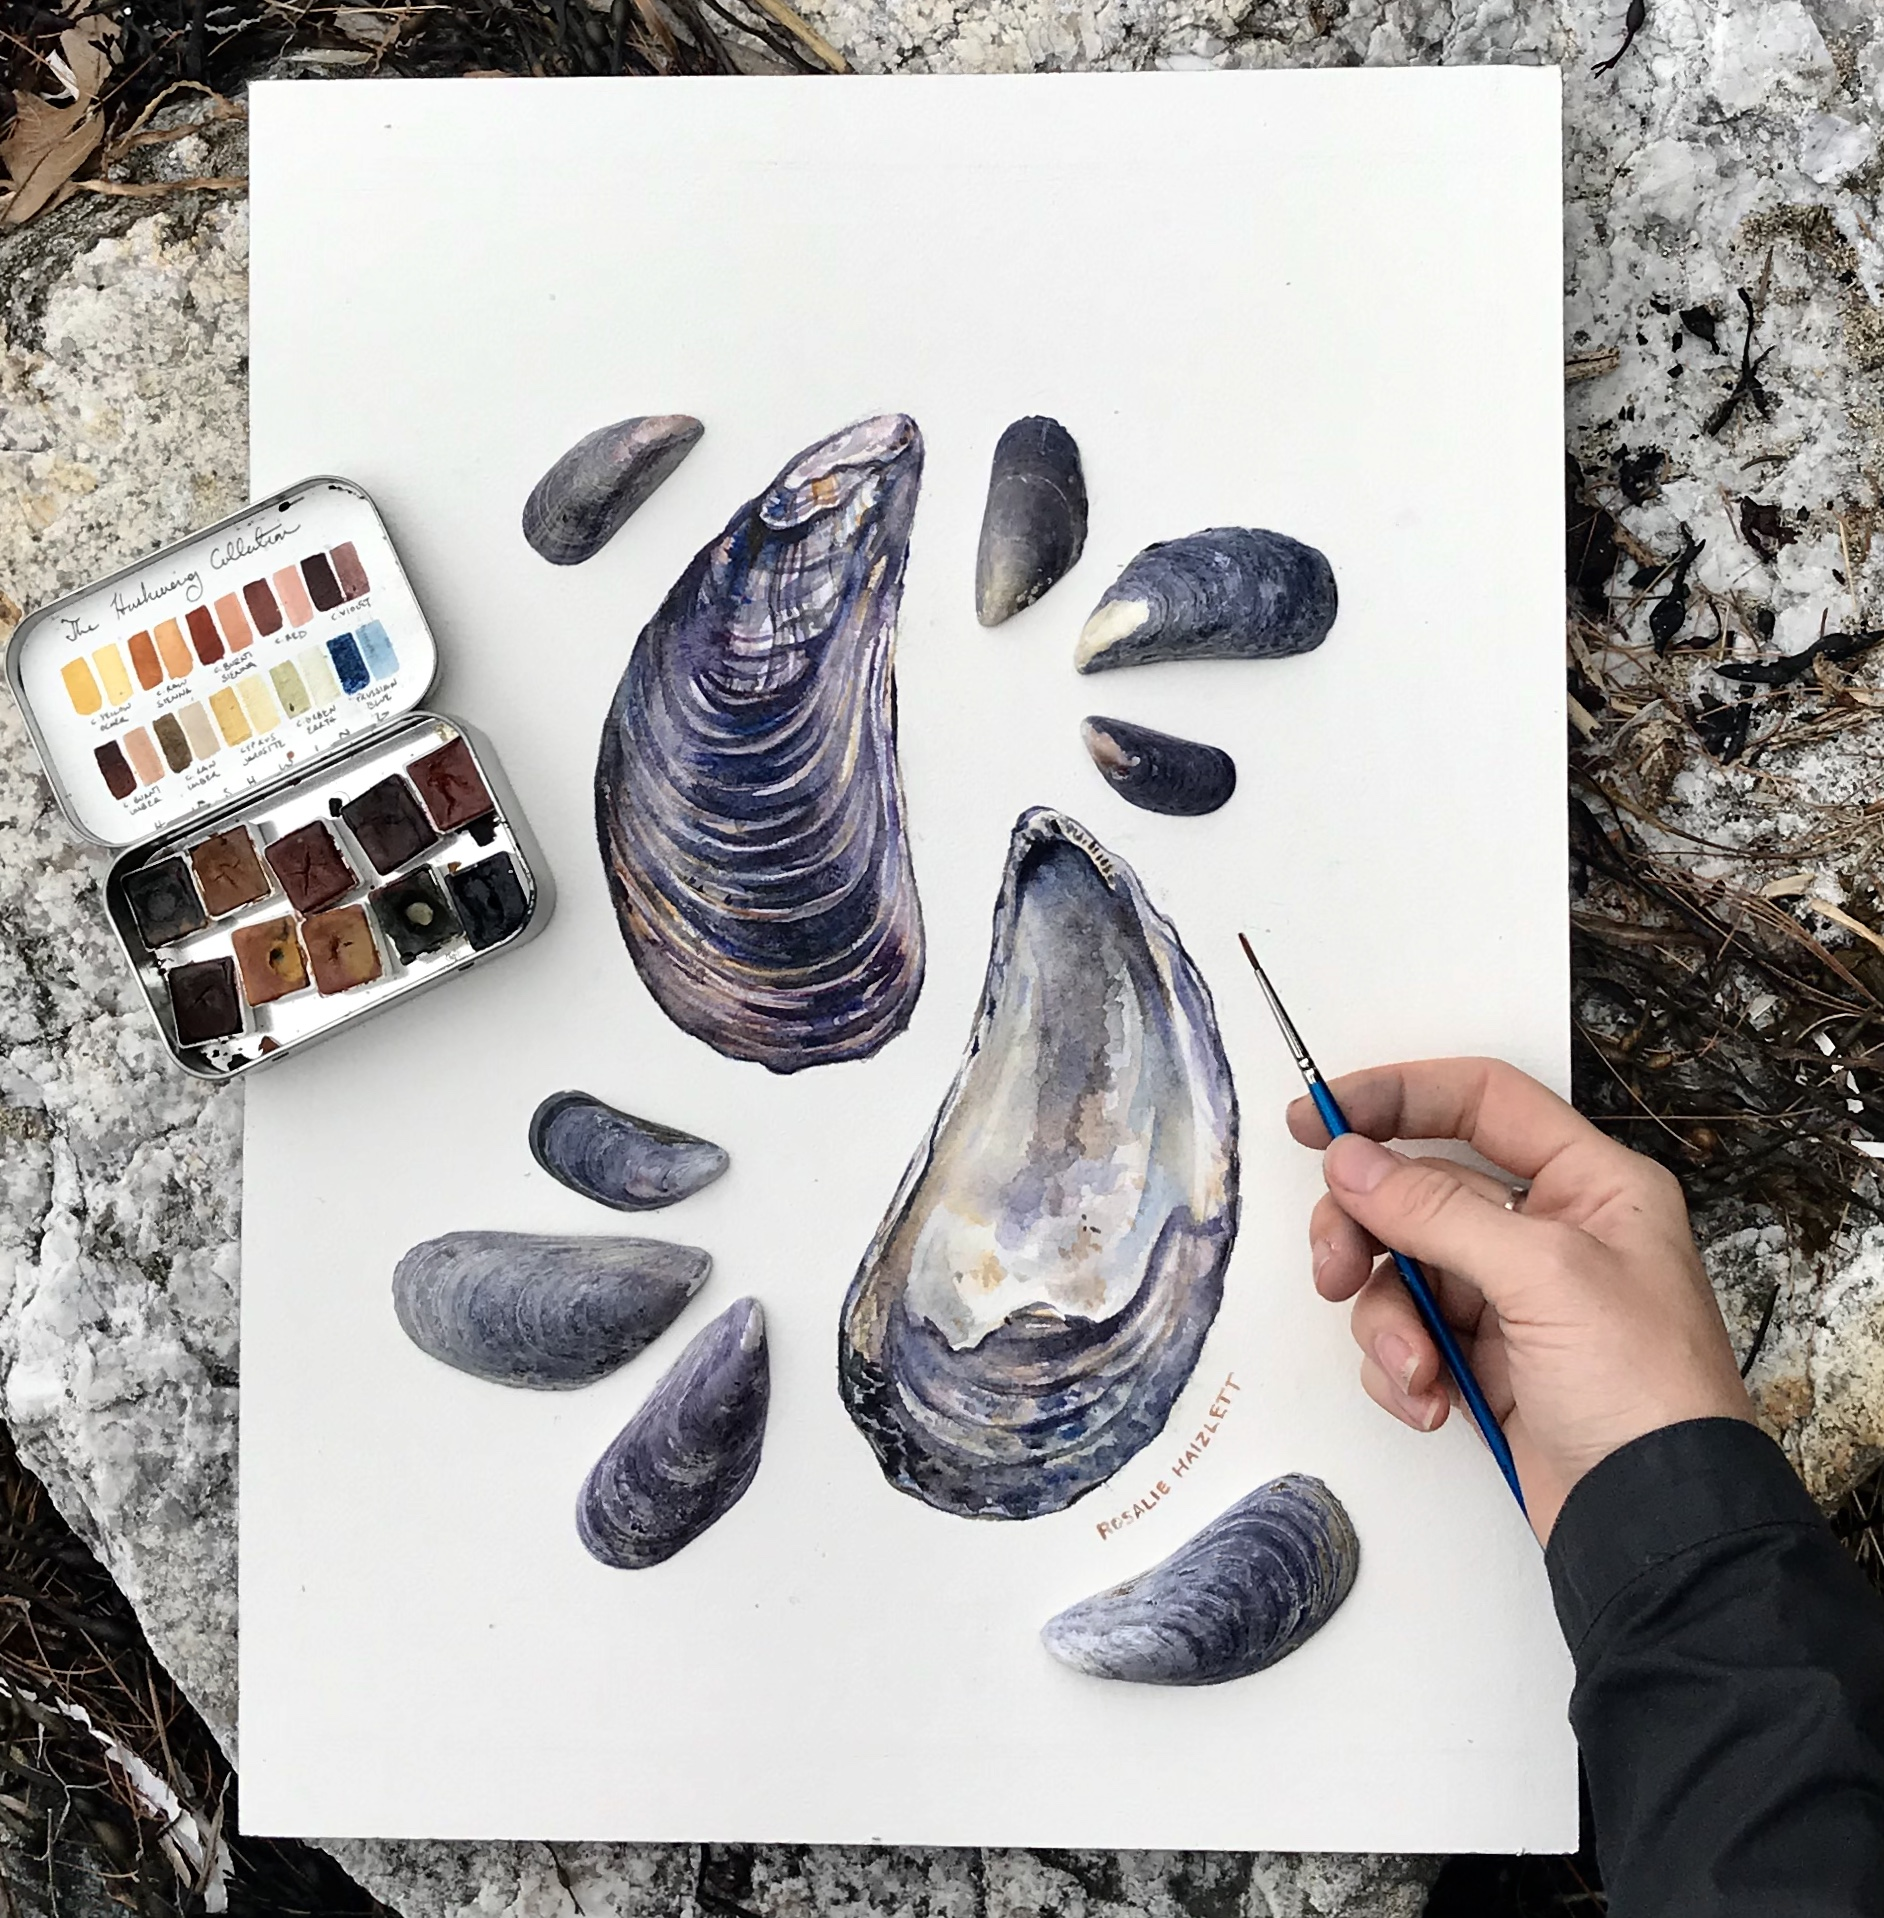 Blue mussels!